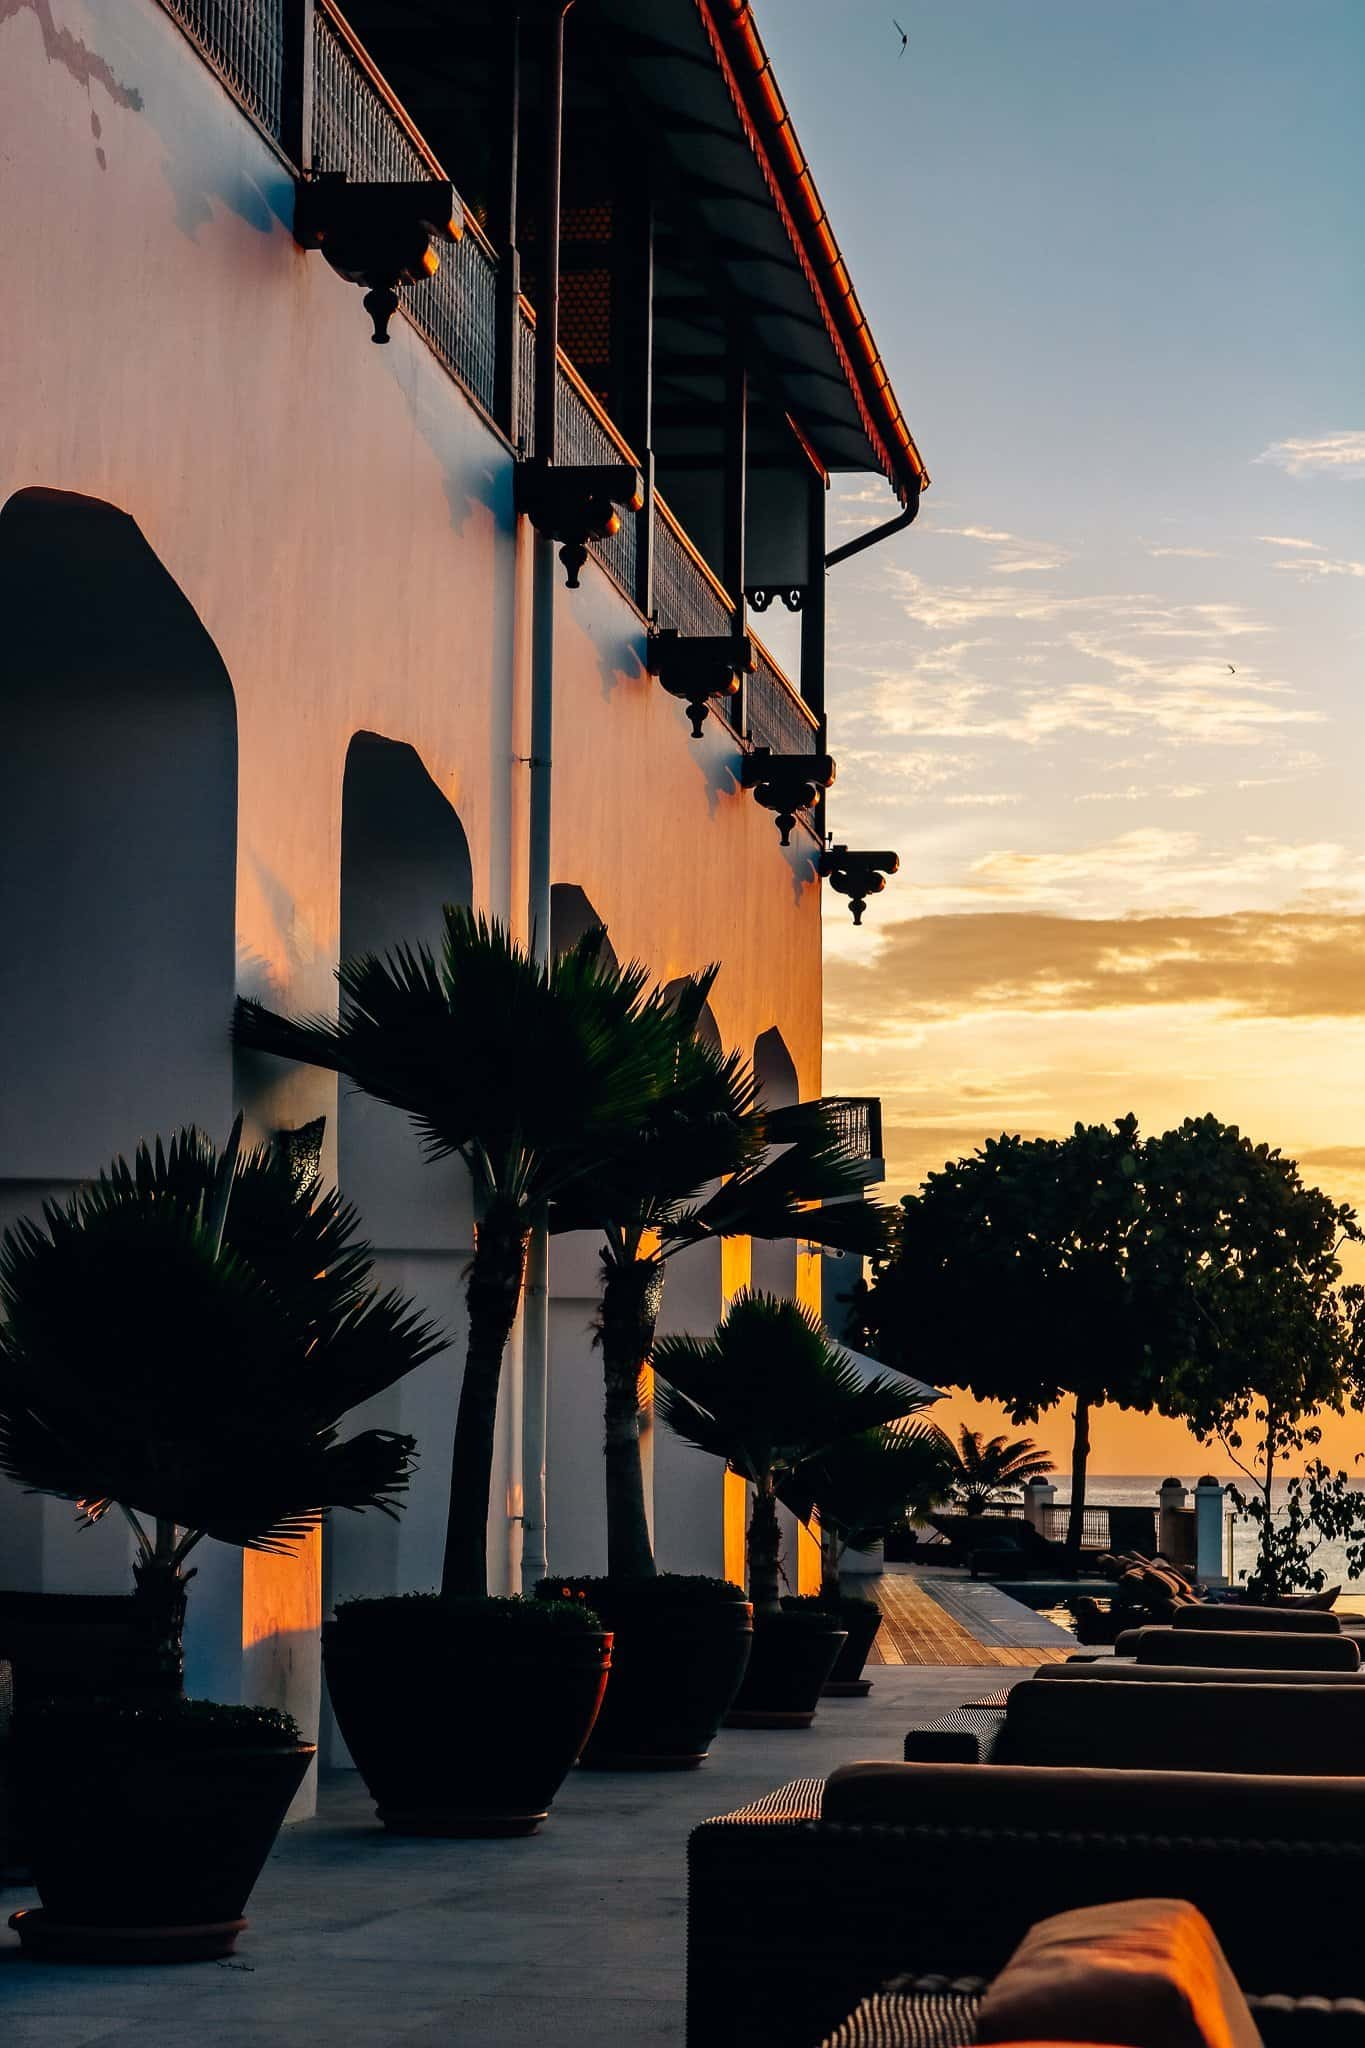 Visions of Zanzibar - Park Hyatt Zanzibar